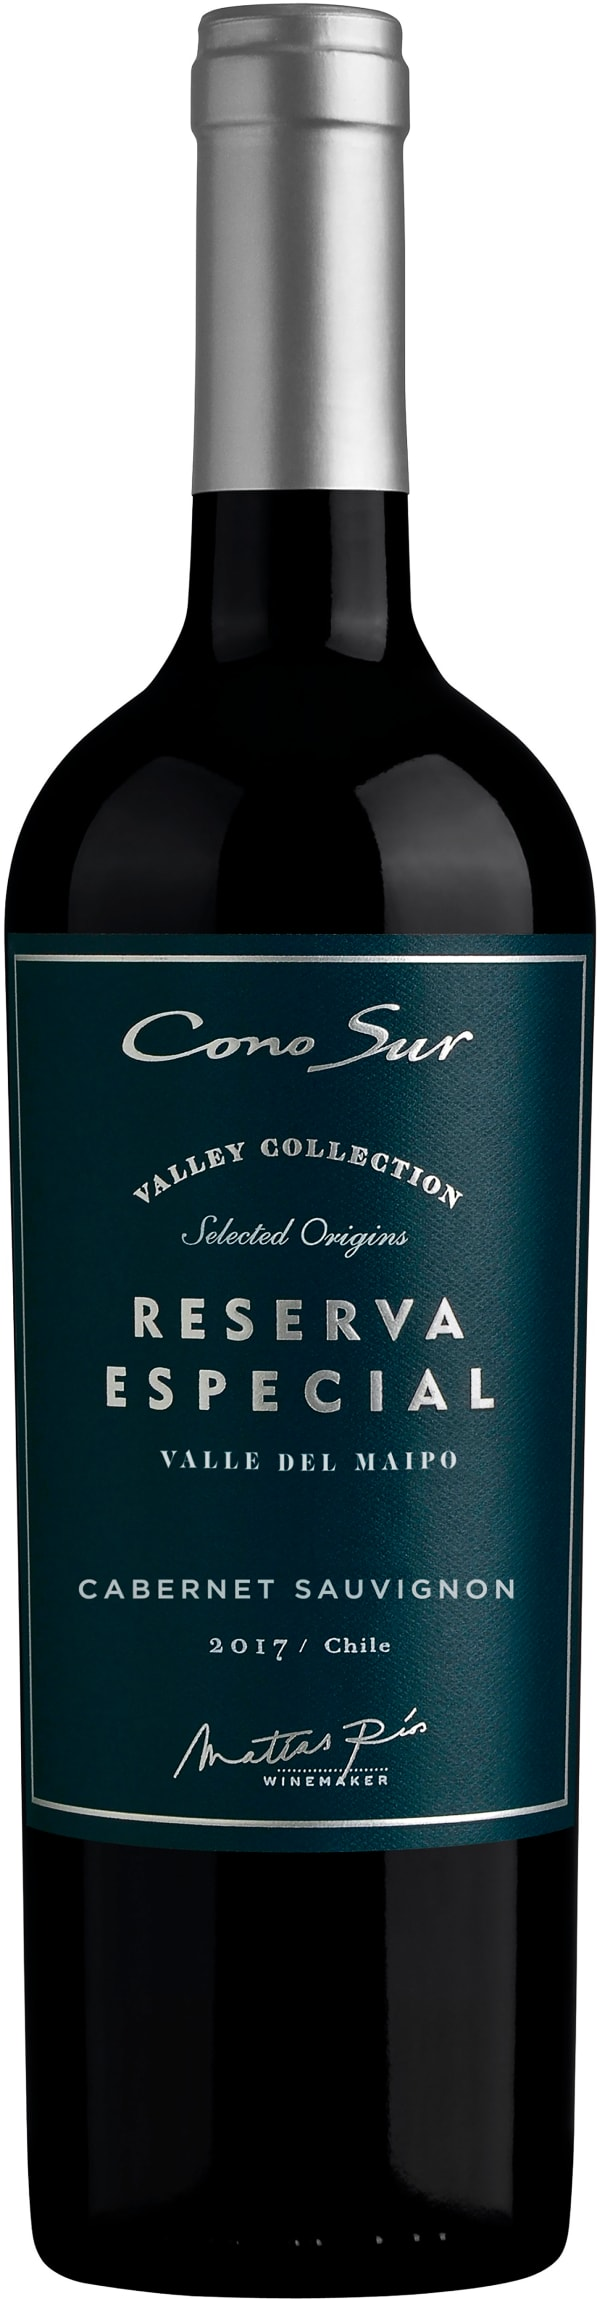 Cono Sur Reserva Especial Cabernet Sauvignon 2018